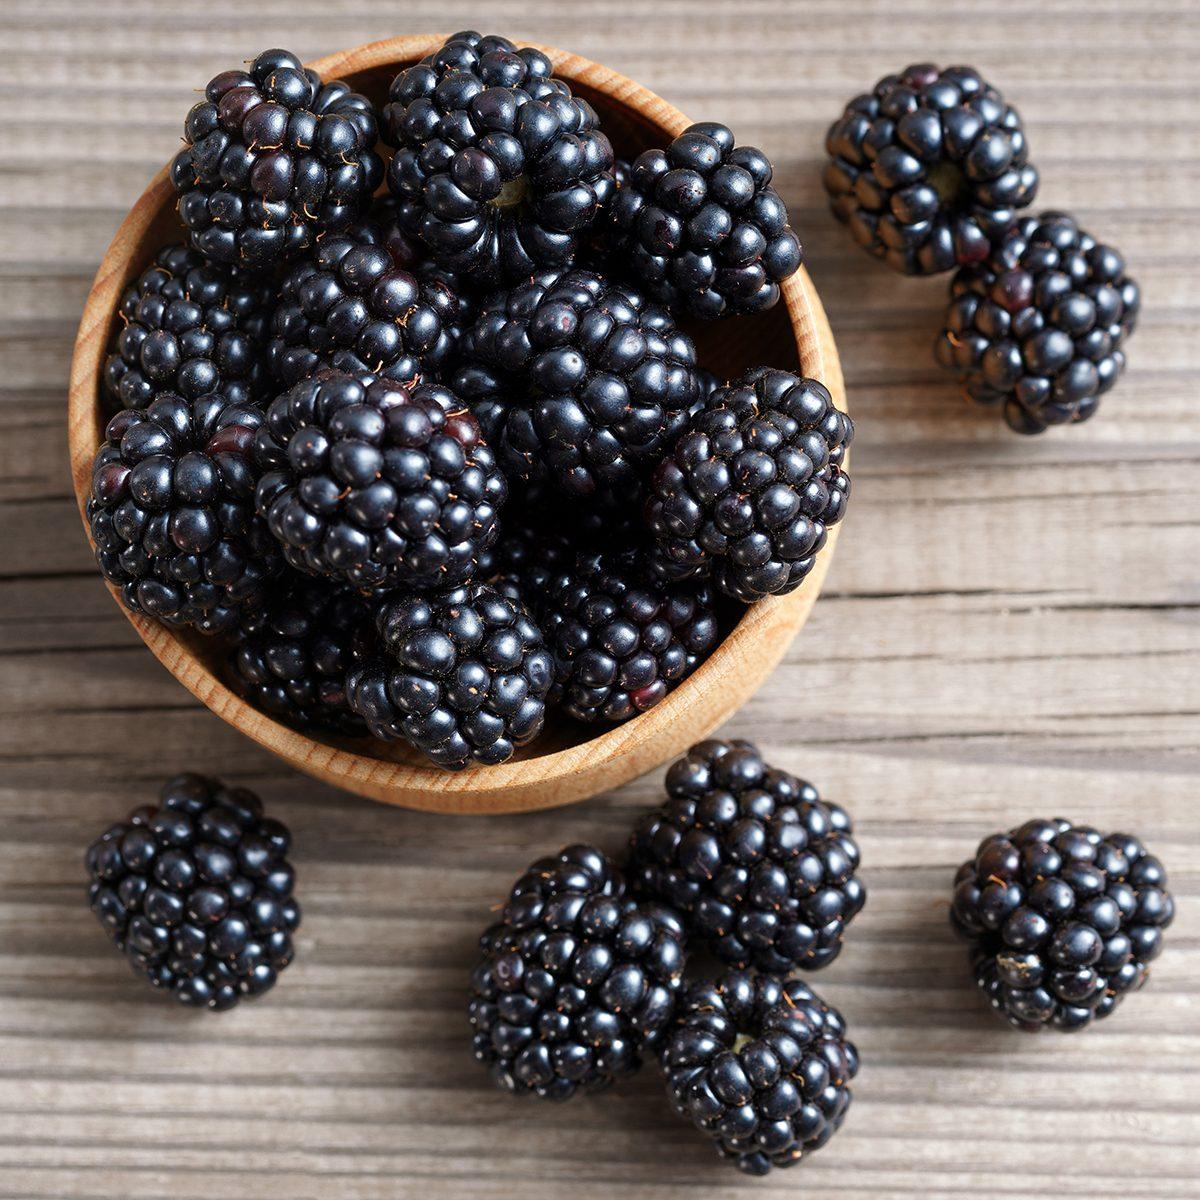 Deluxe blackberries in bowl on wooden background.